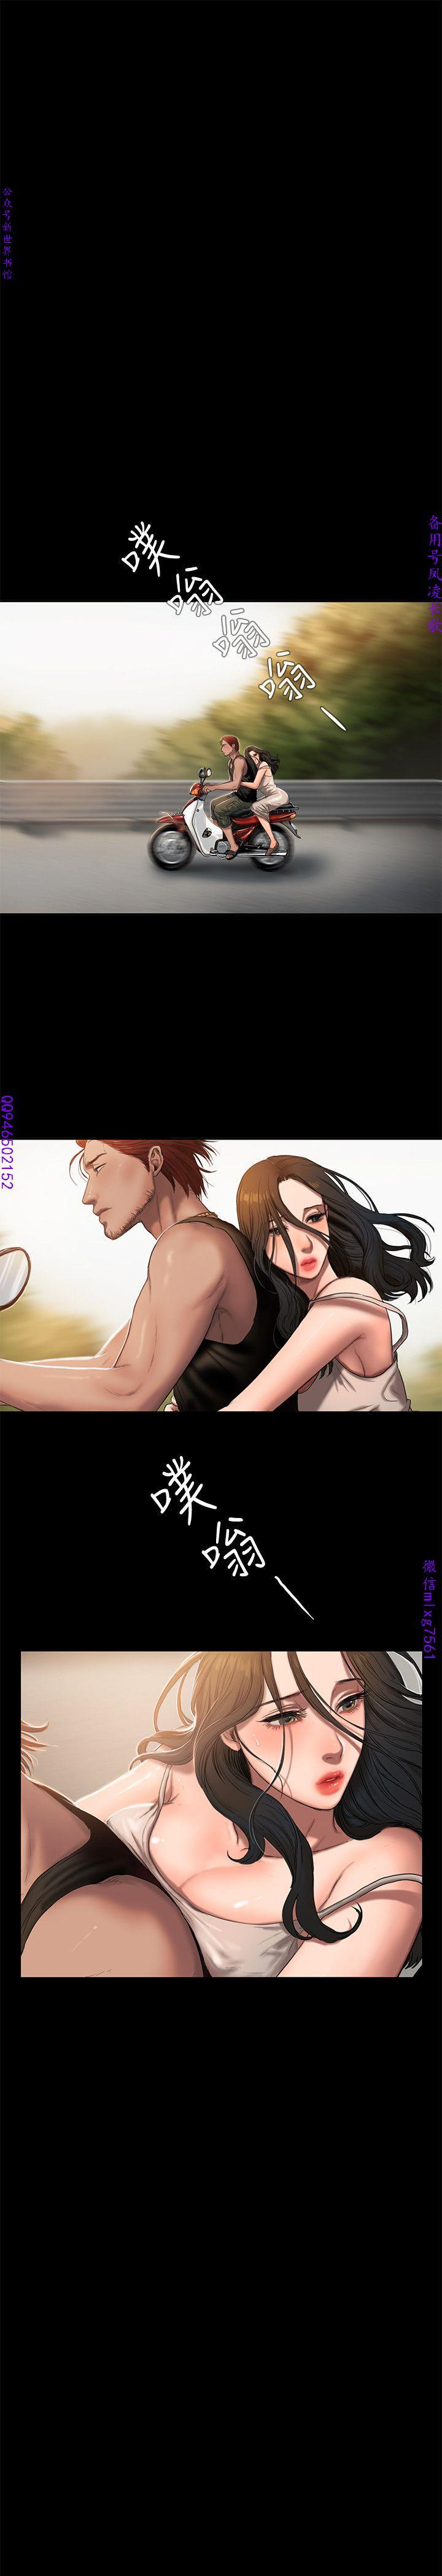 Run away 1-10【中文】 13